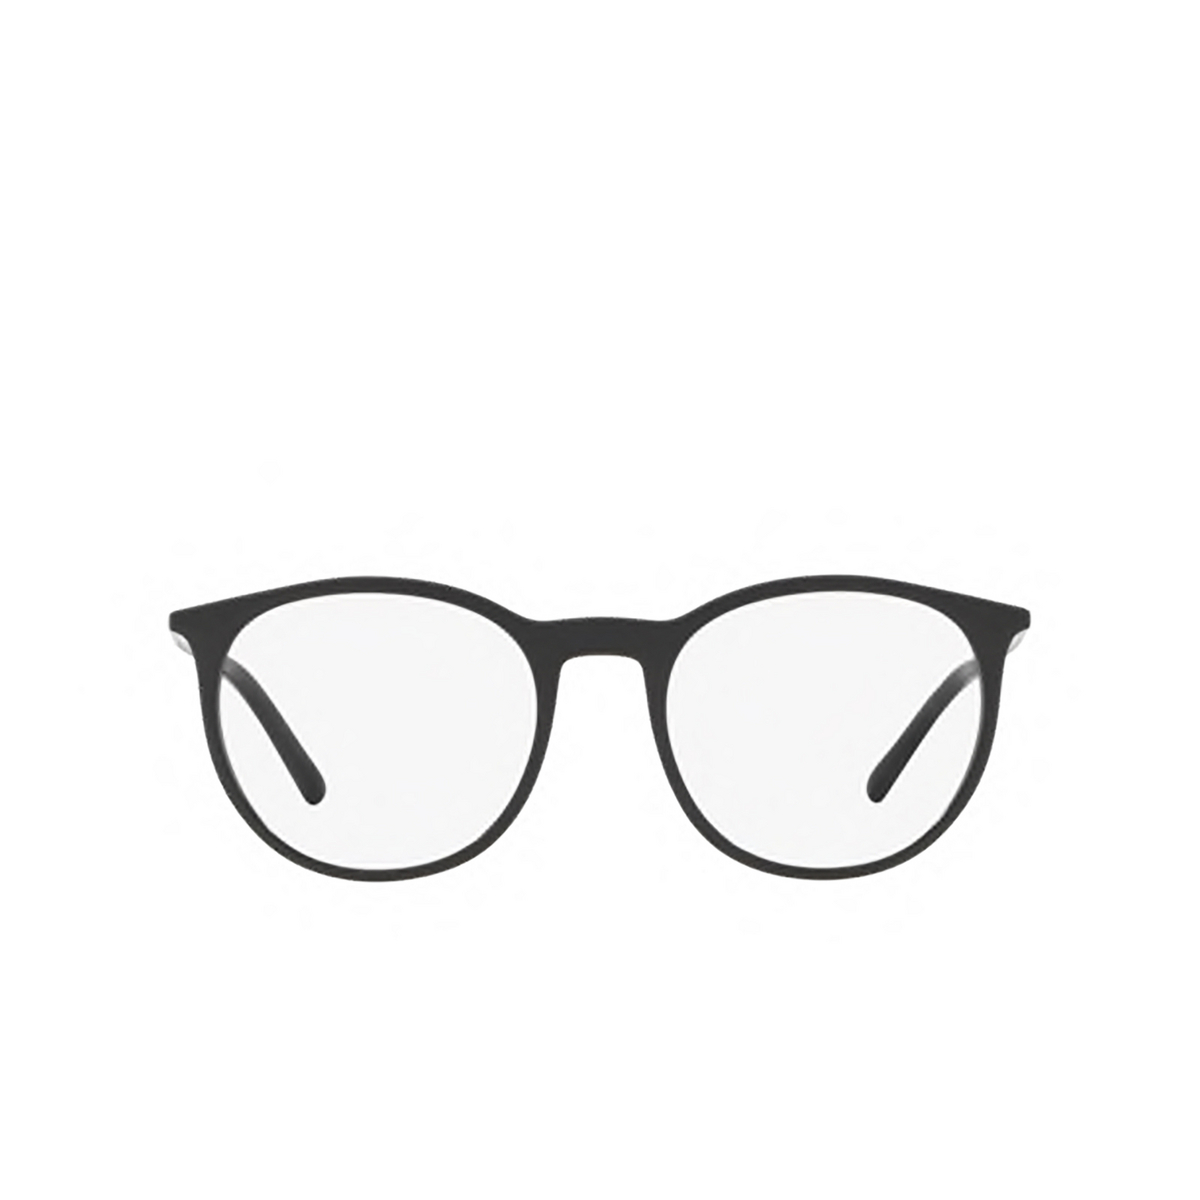 Dolce & Gabbana® Round Eyeglasses: DG5031 color 501 - front view.